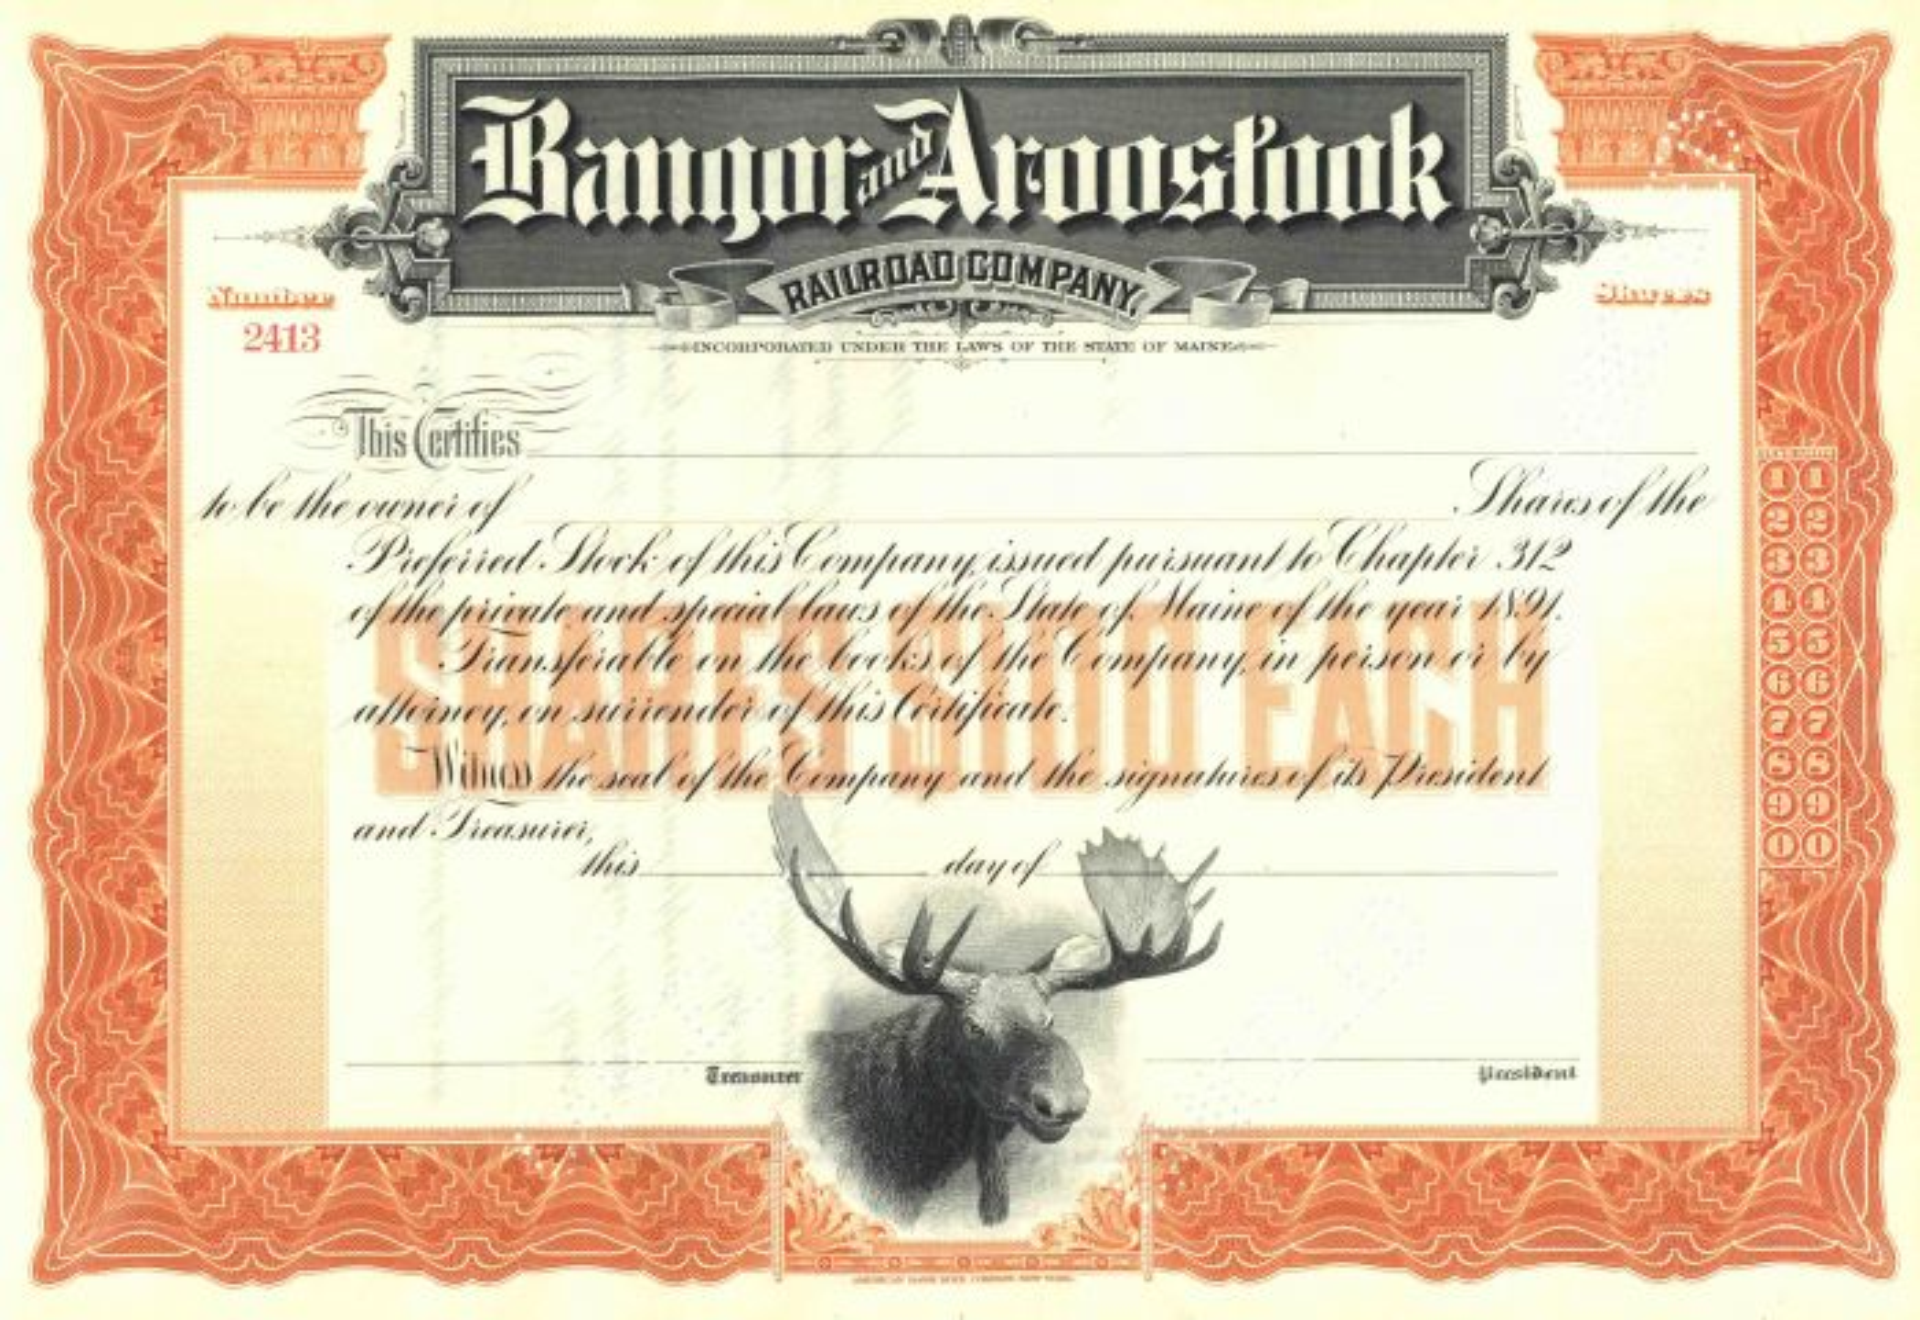 Bangor and Aroostook Railroad - Gorgeous Moose Vignette - Stock Certificate